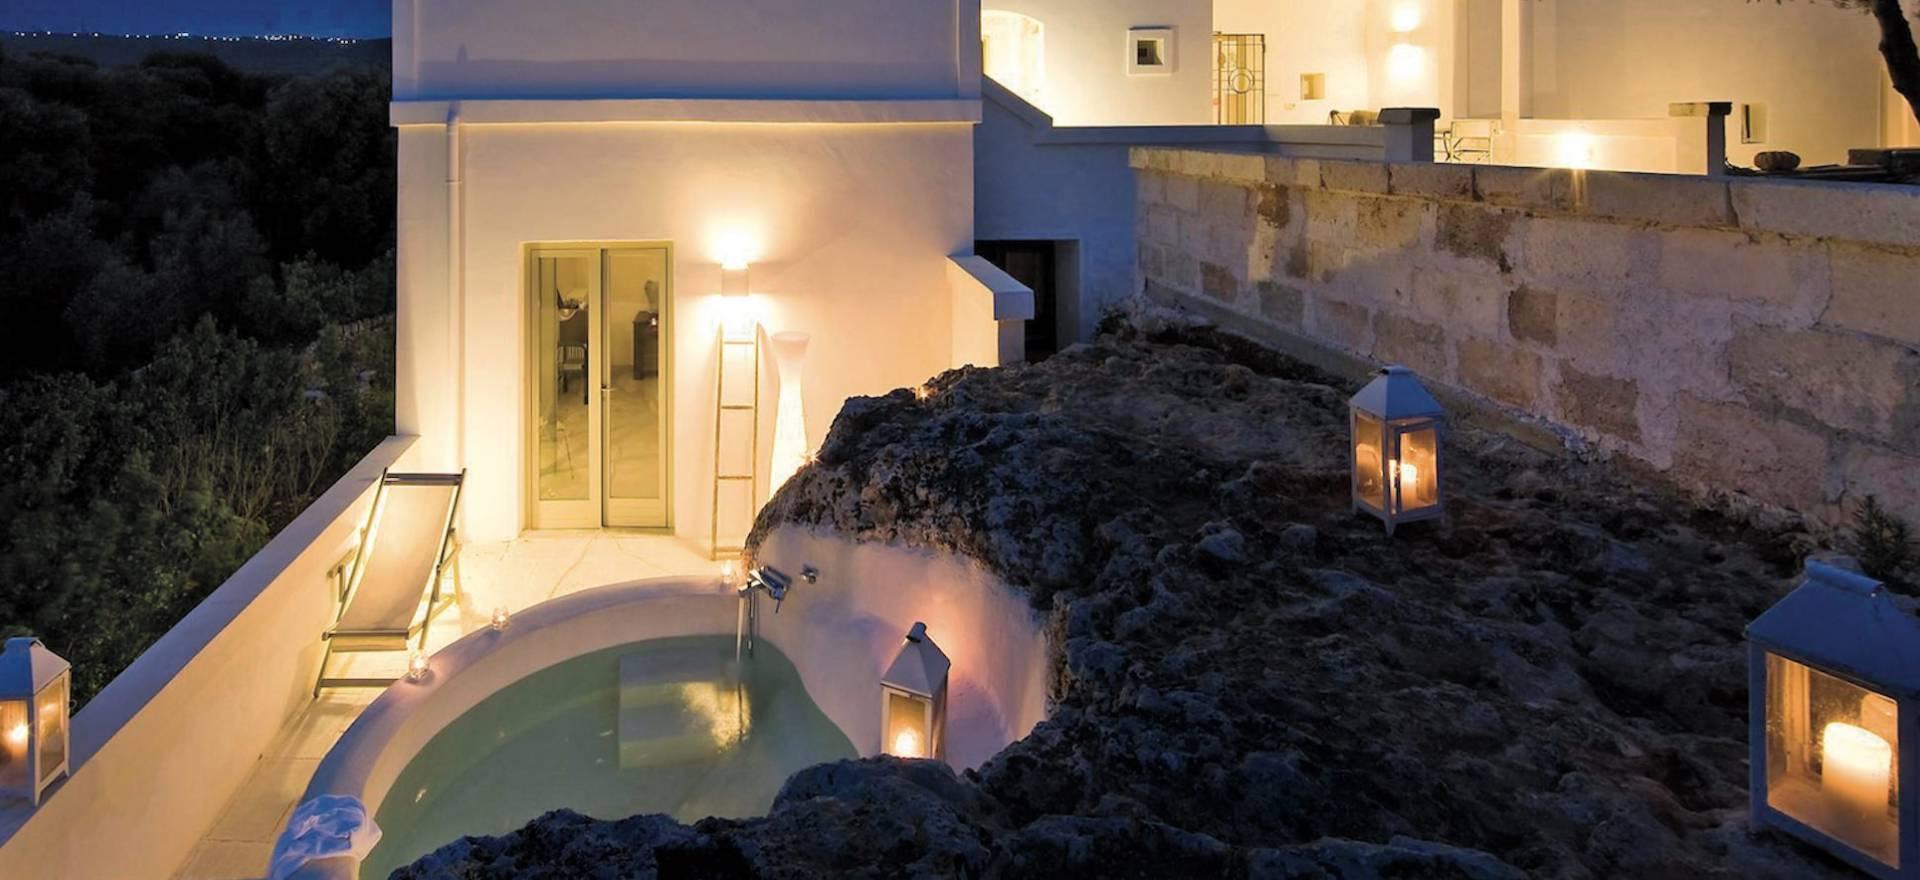 Rustige masseria in Puglia met stijlvol interieur